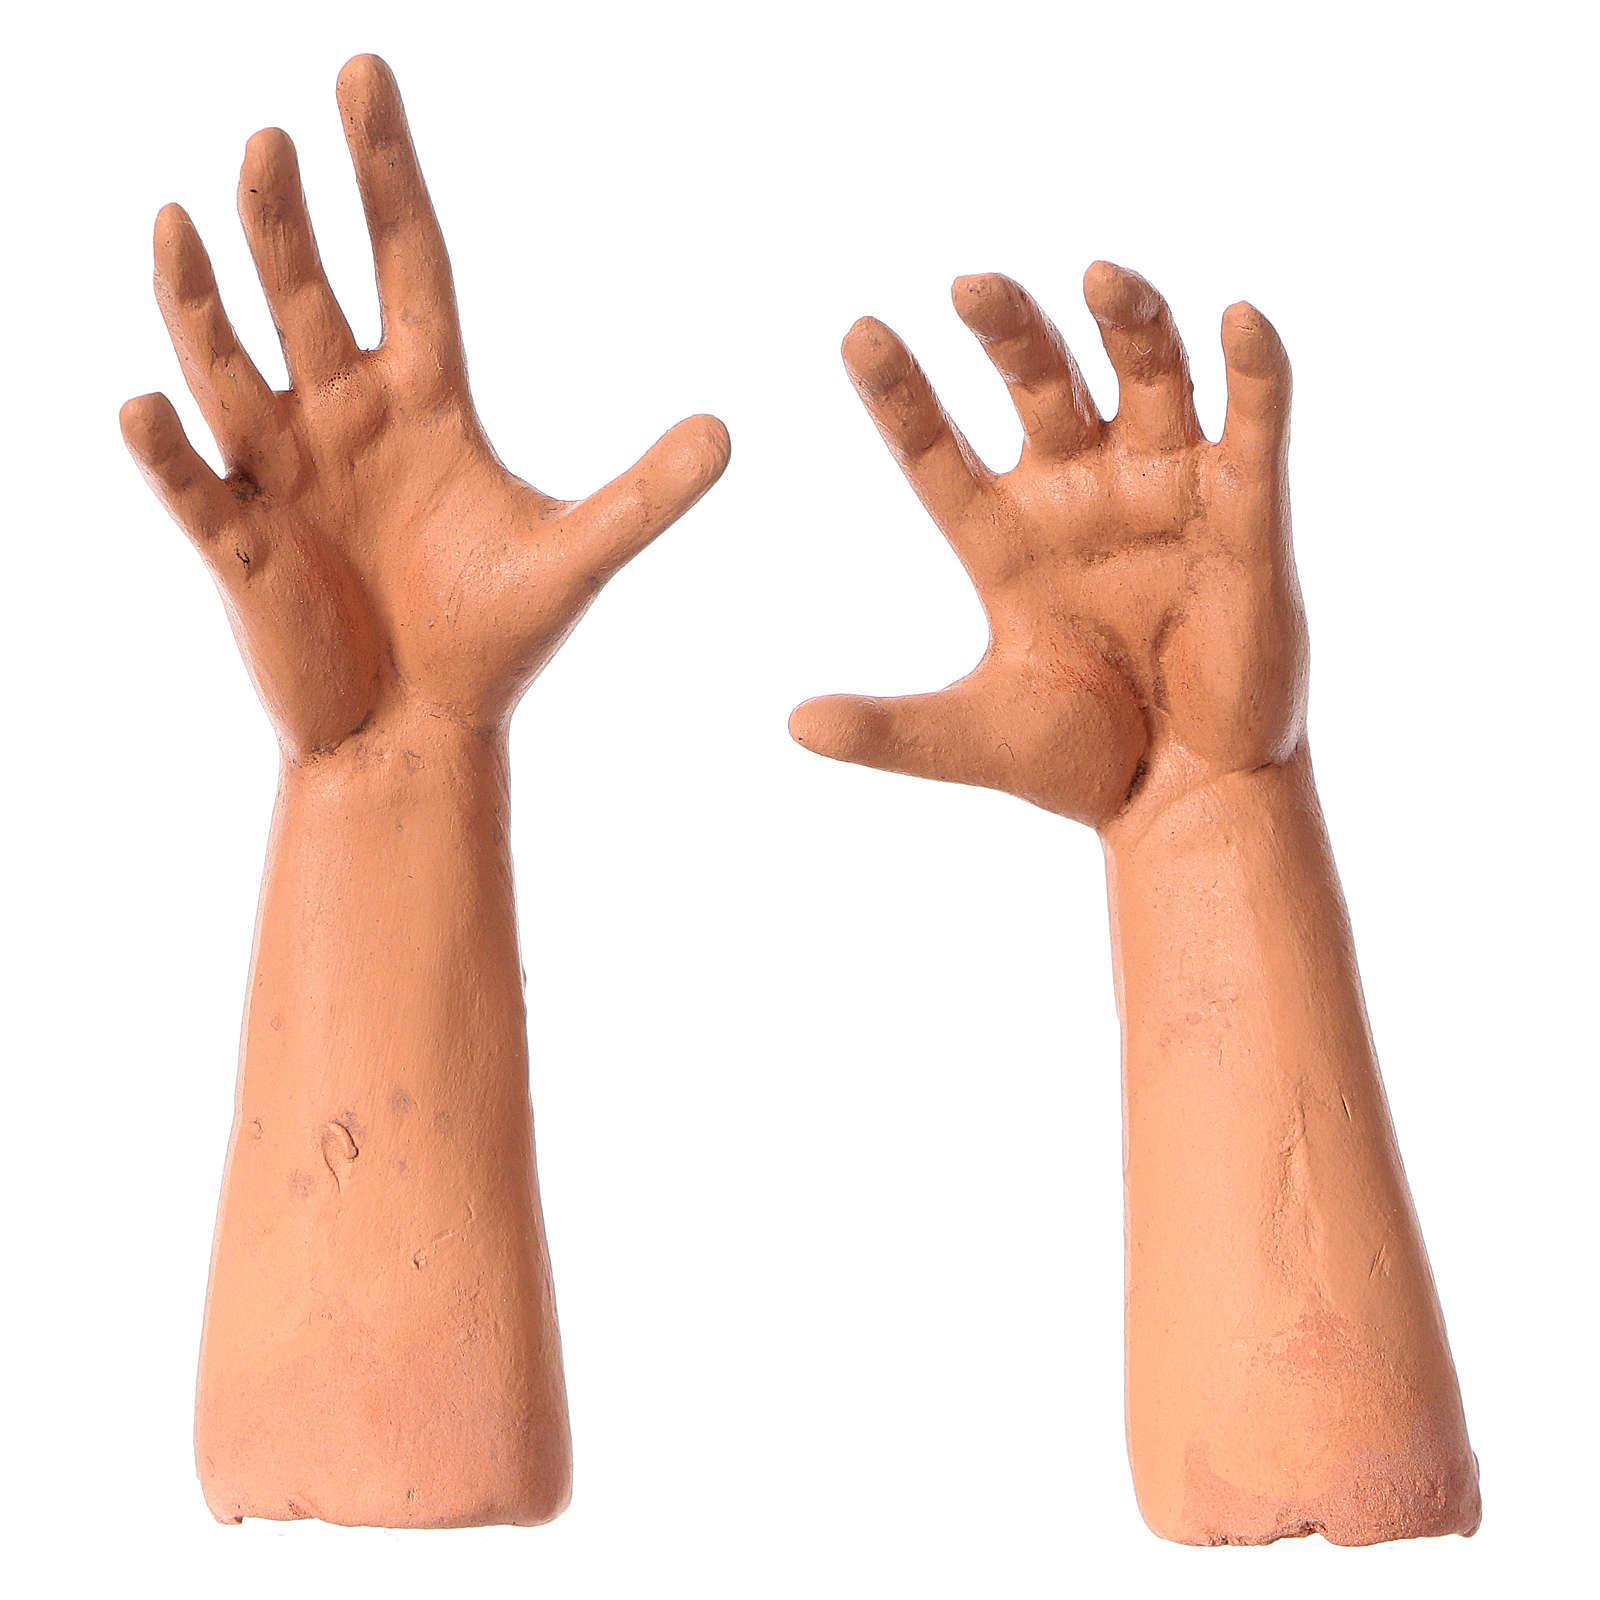 Set mani testa piedi occhi vetro Meravigliato 35 cm 4